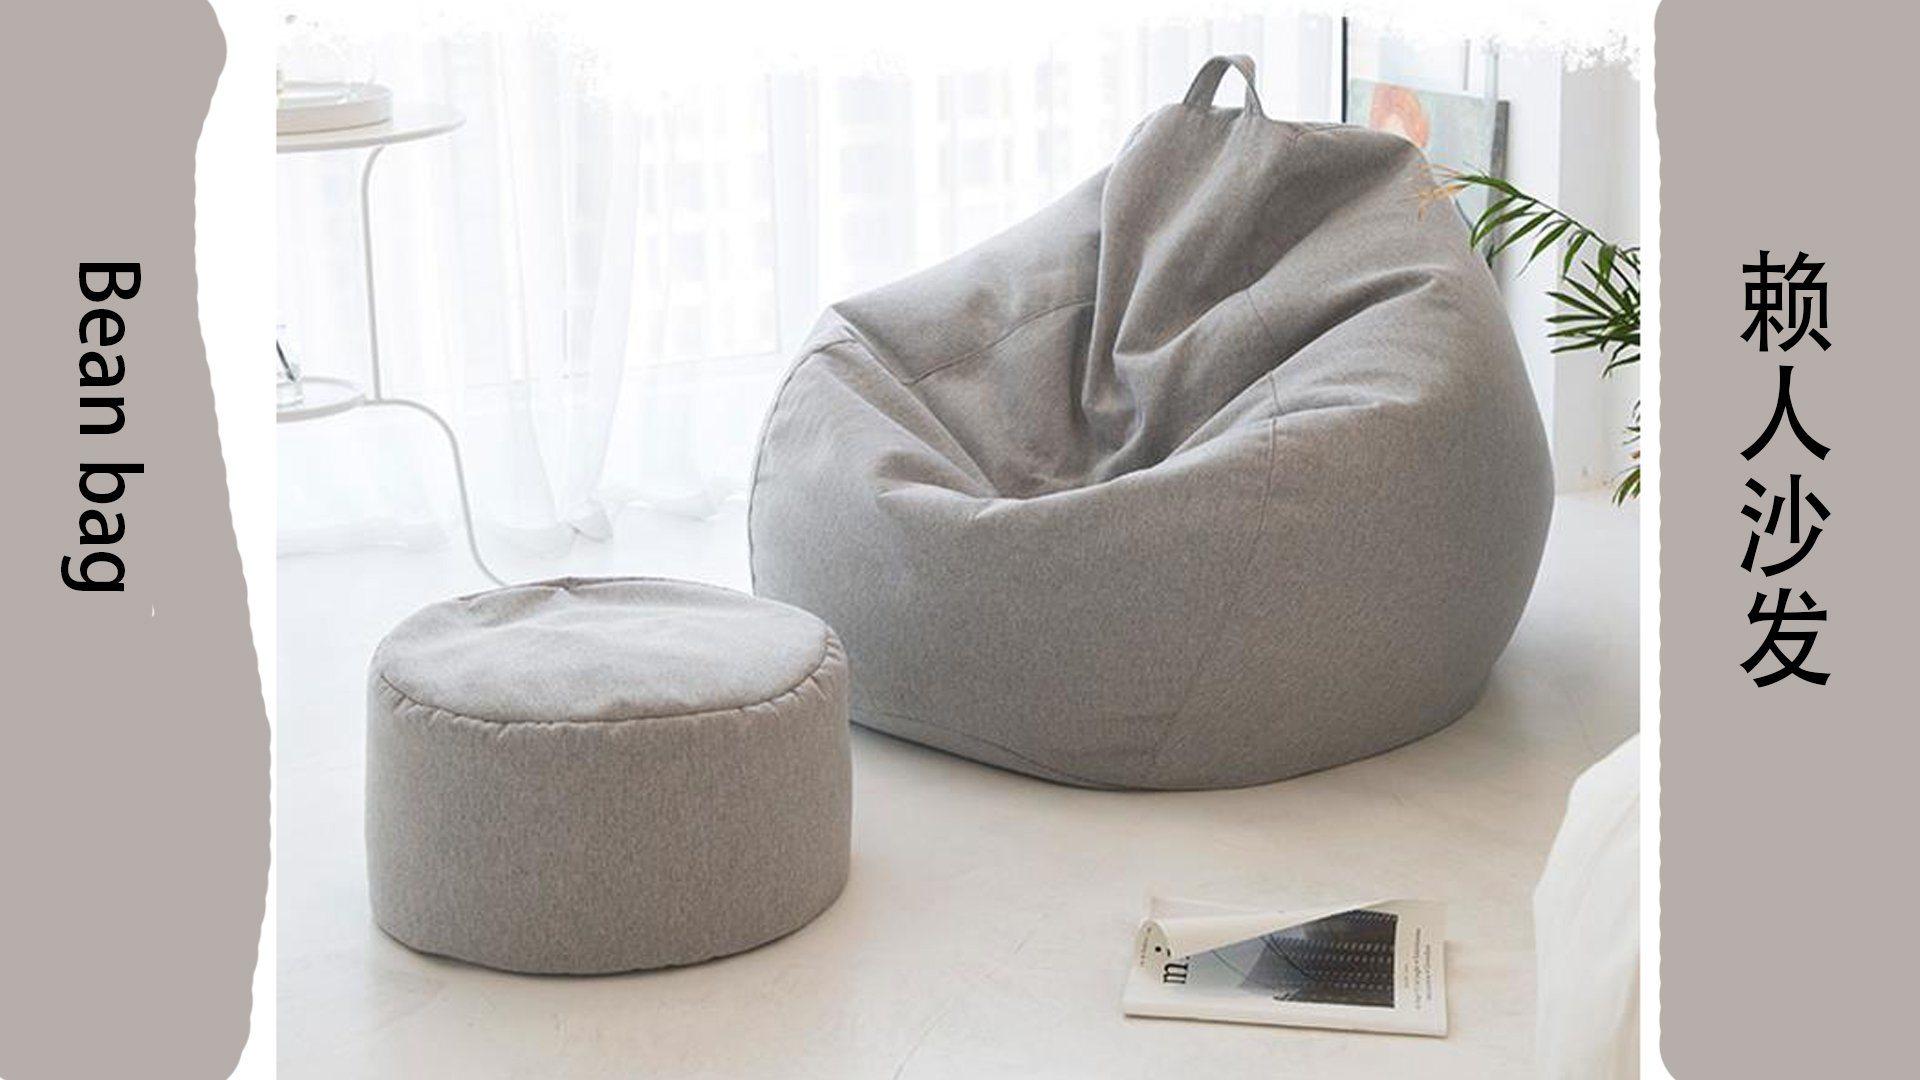 Borsa chair - Extra Large, farcito Animal Storage & Memory Foam - Lavabile Premium Soft Cotton Linen, Sturdy Zipper Beanbag Case